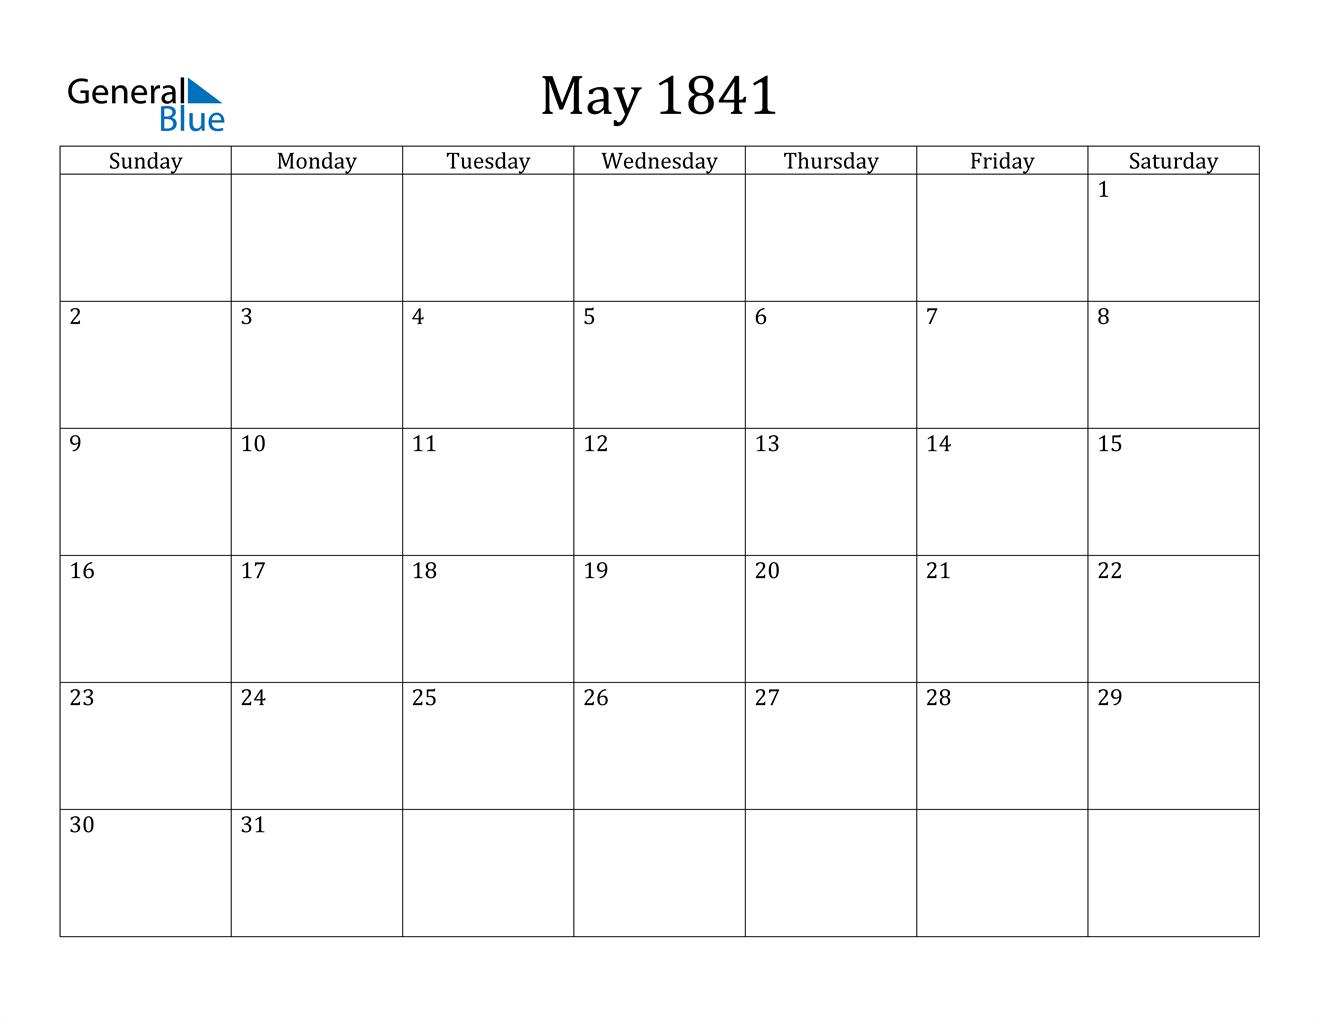 Image of May 1841 Calendar